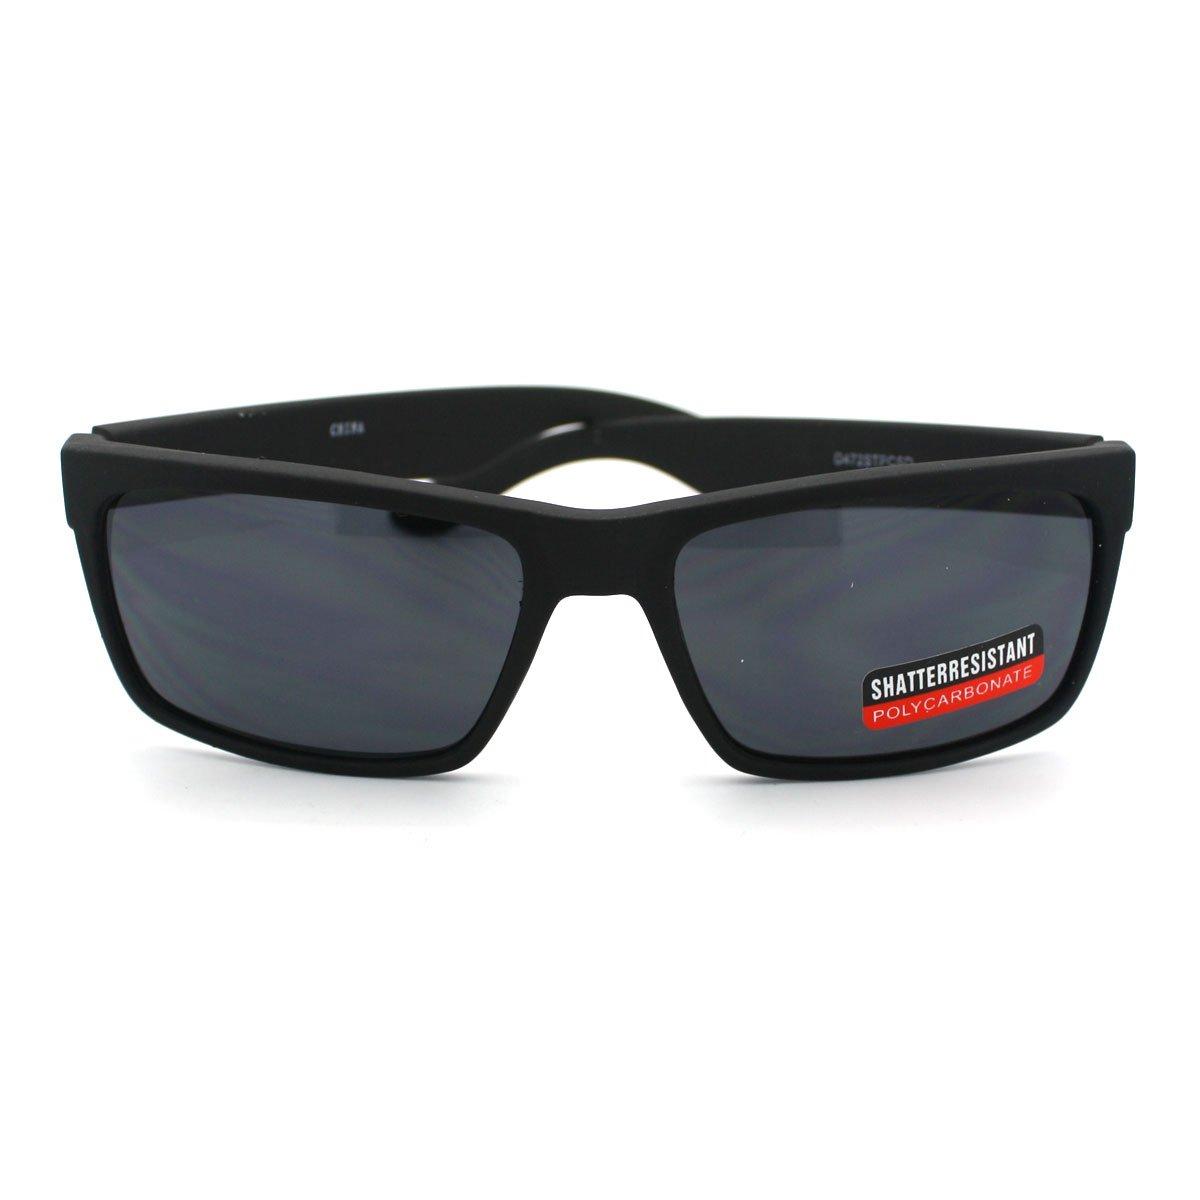 Soft Matte Finish Mens Narrow Rectangular Sporty Sunglasses